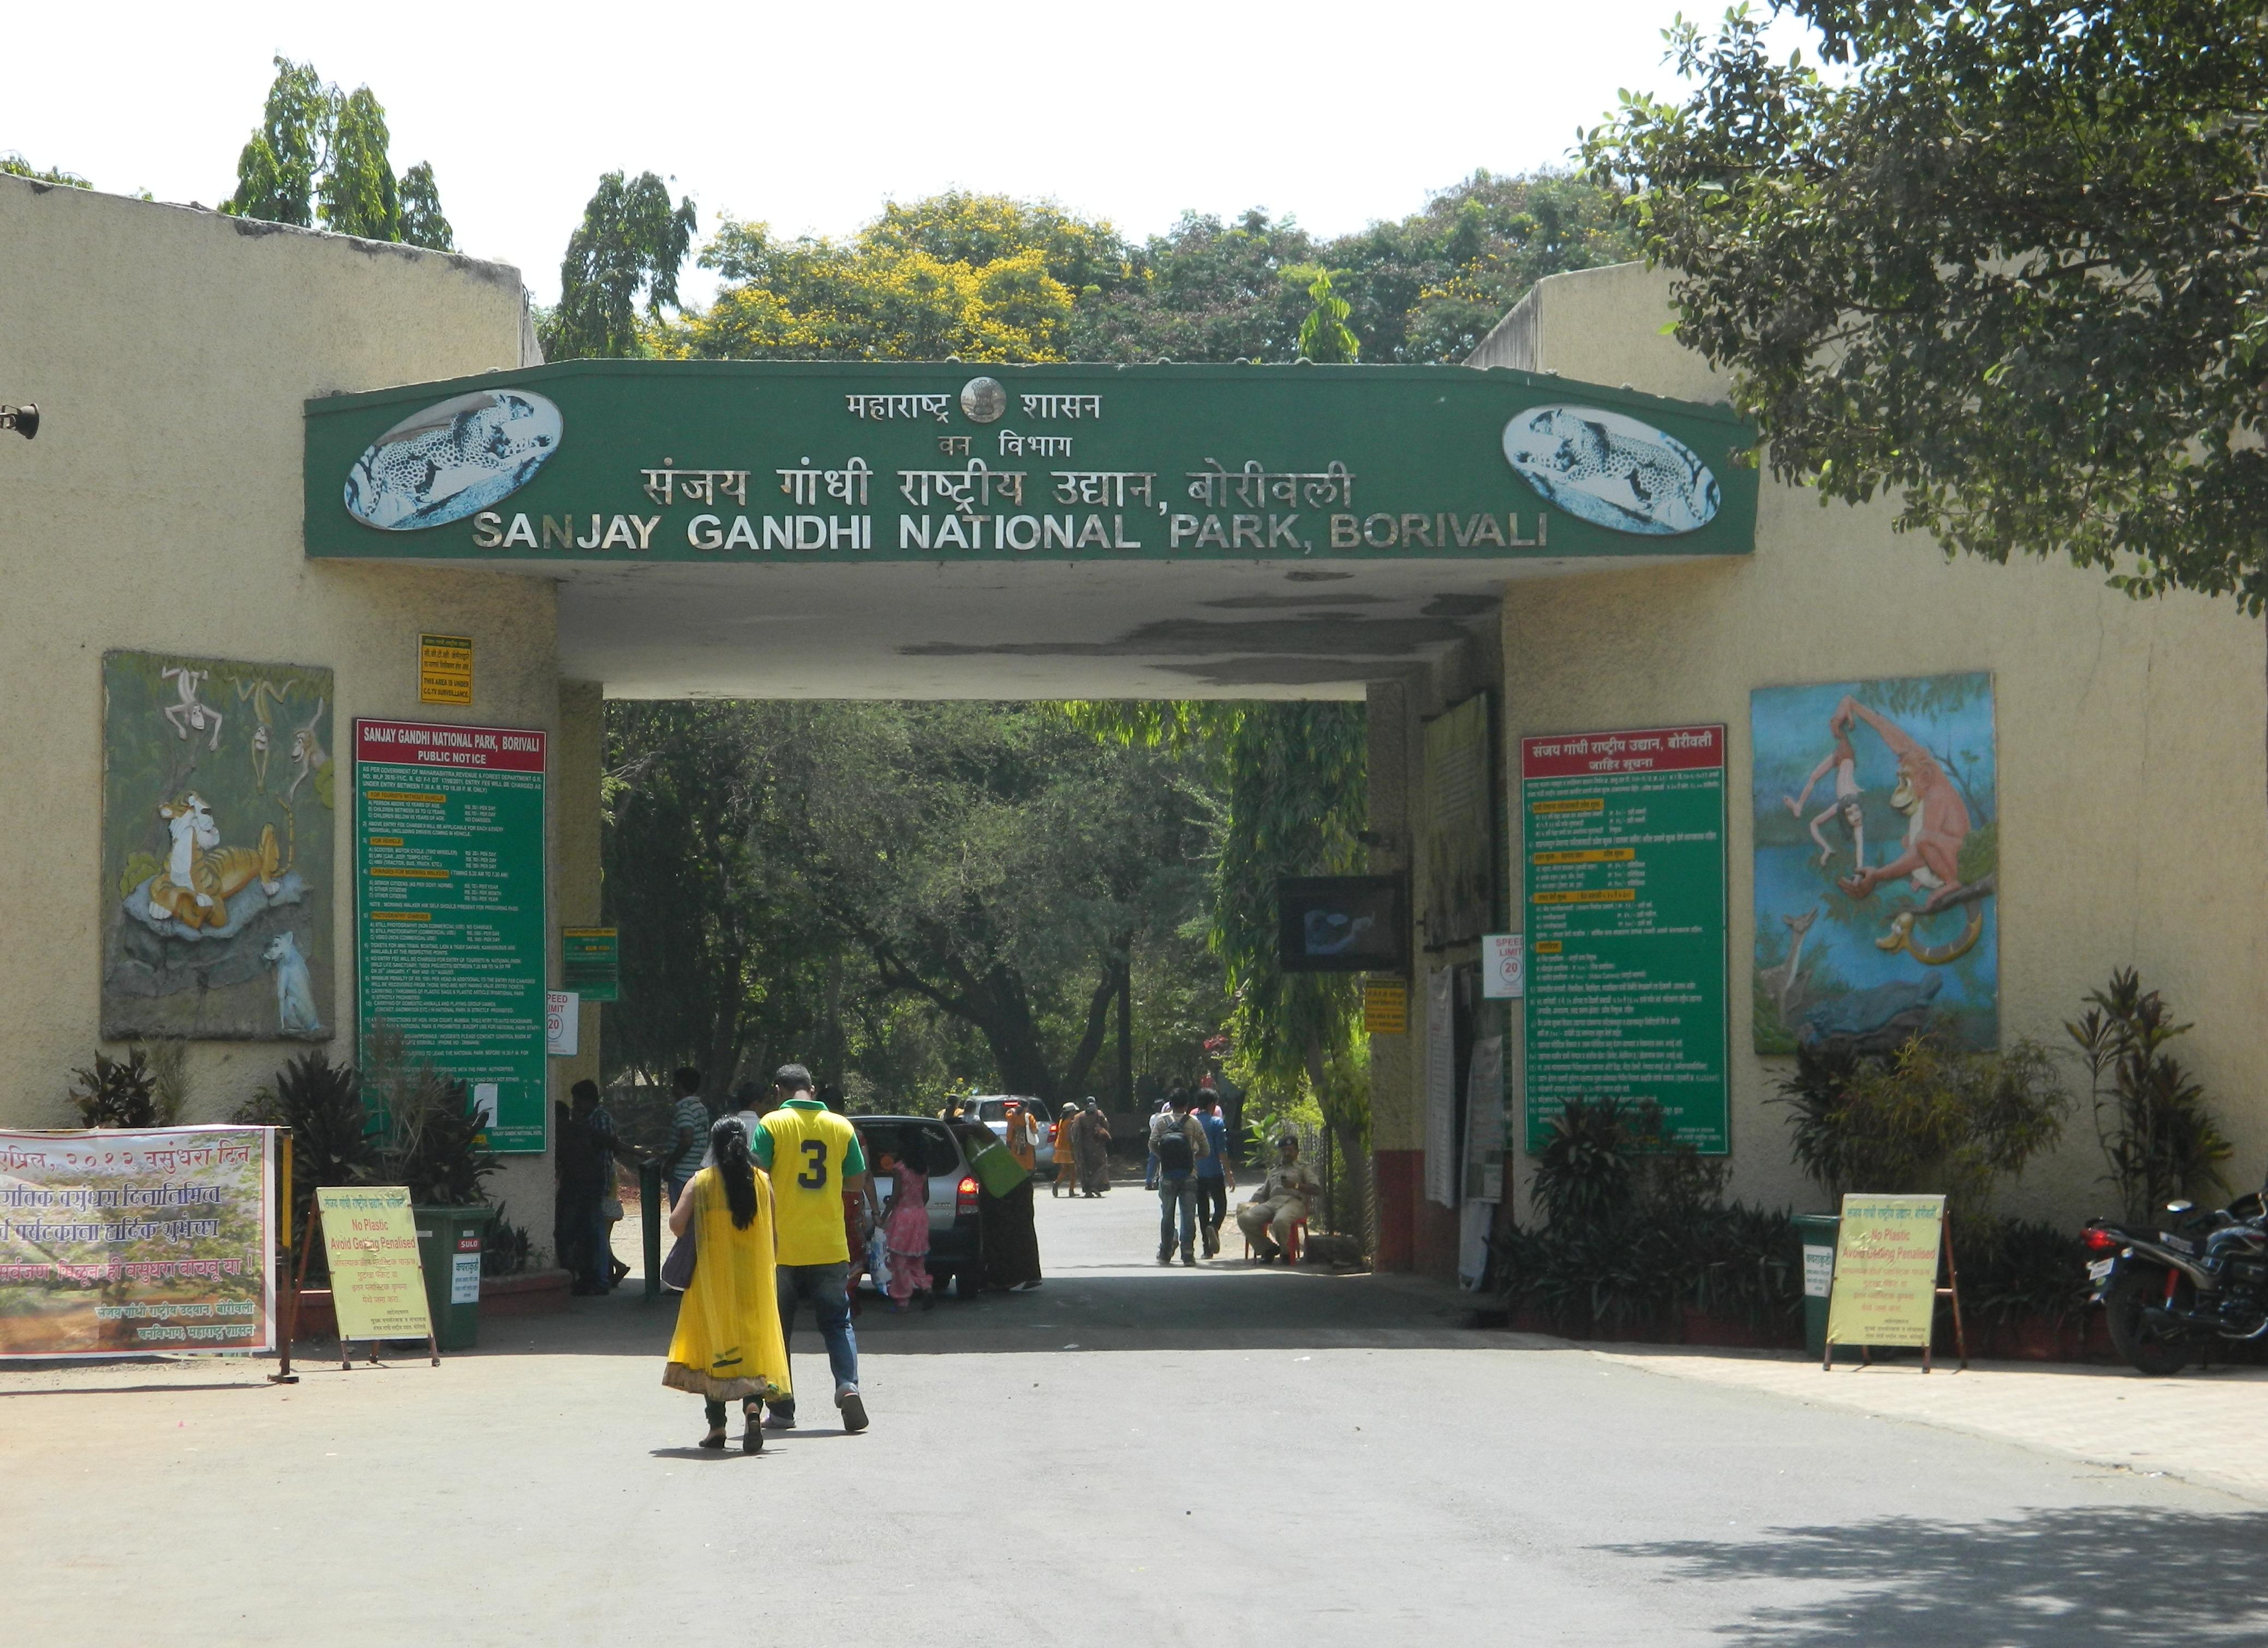 dating.com reviews 2015 indian national park